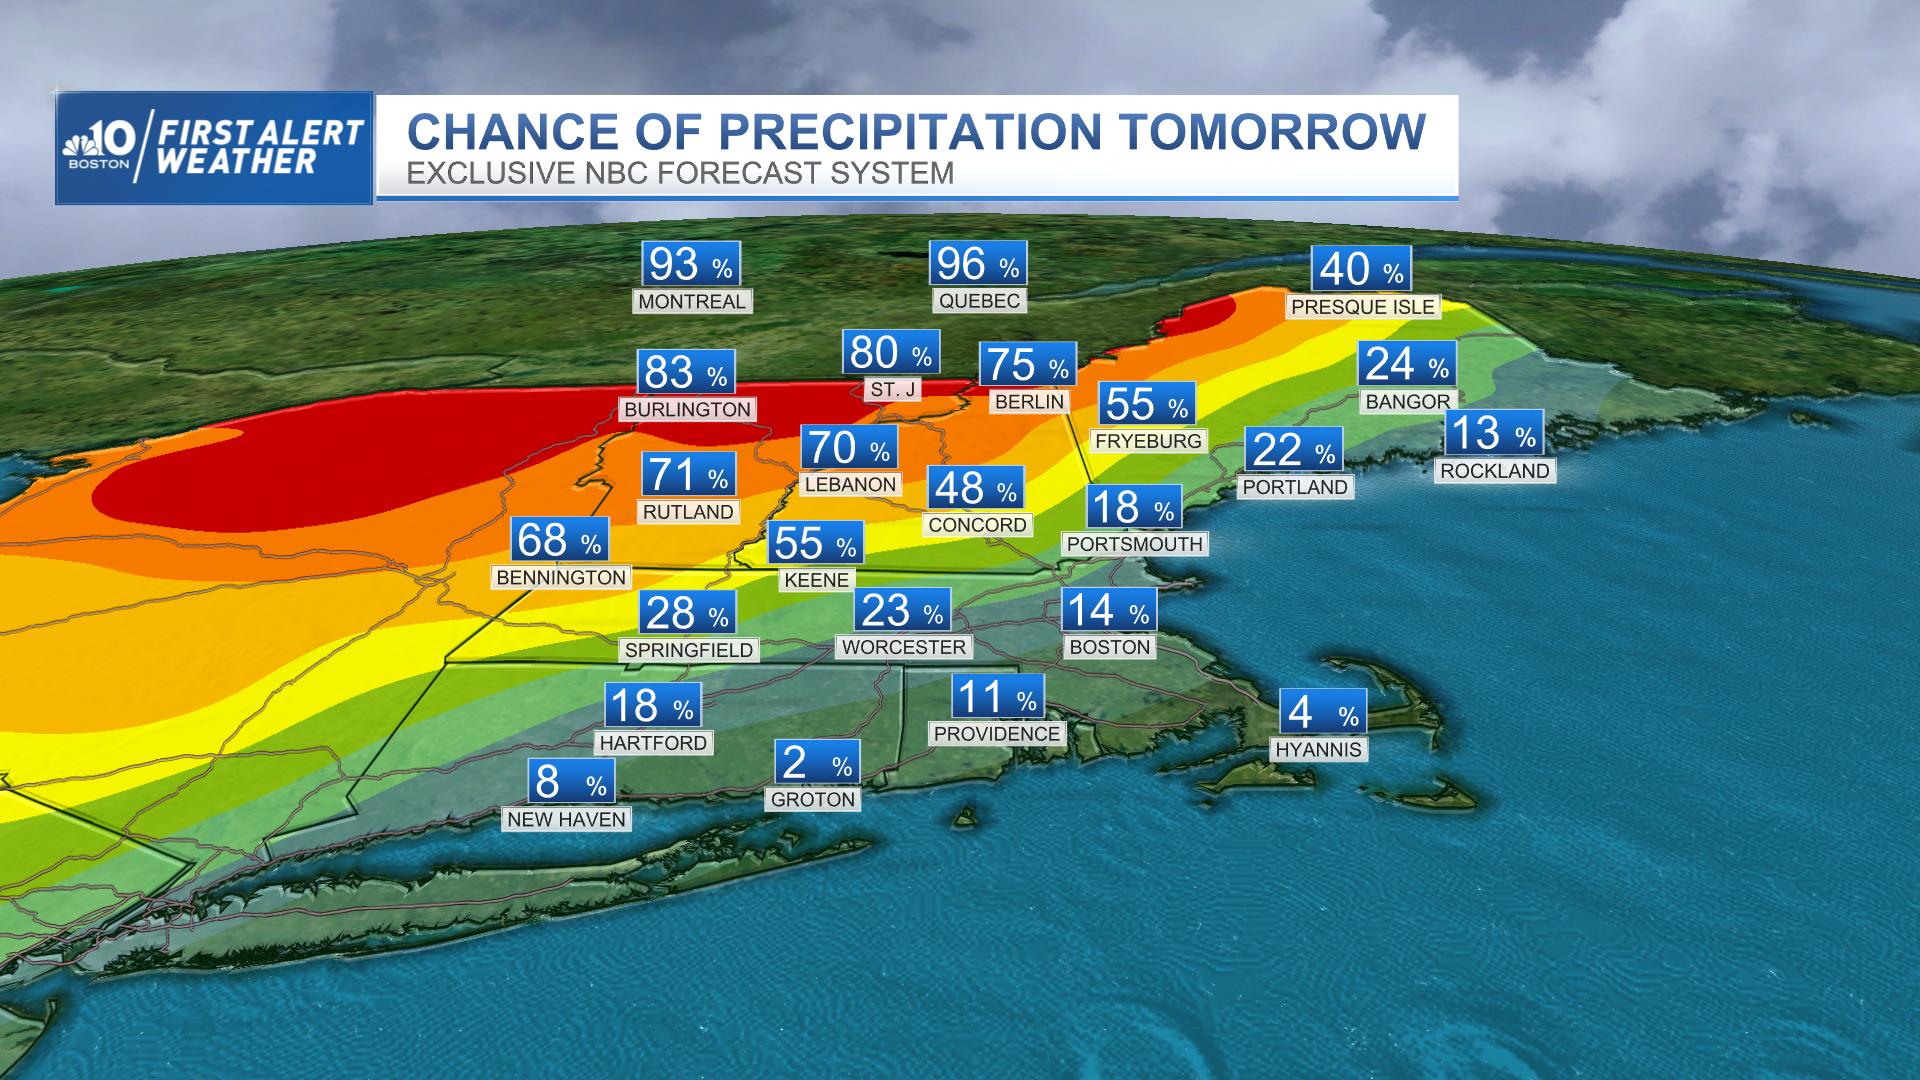 Tomorrow's Chance of Precipitation